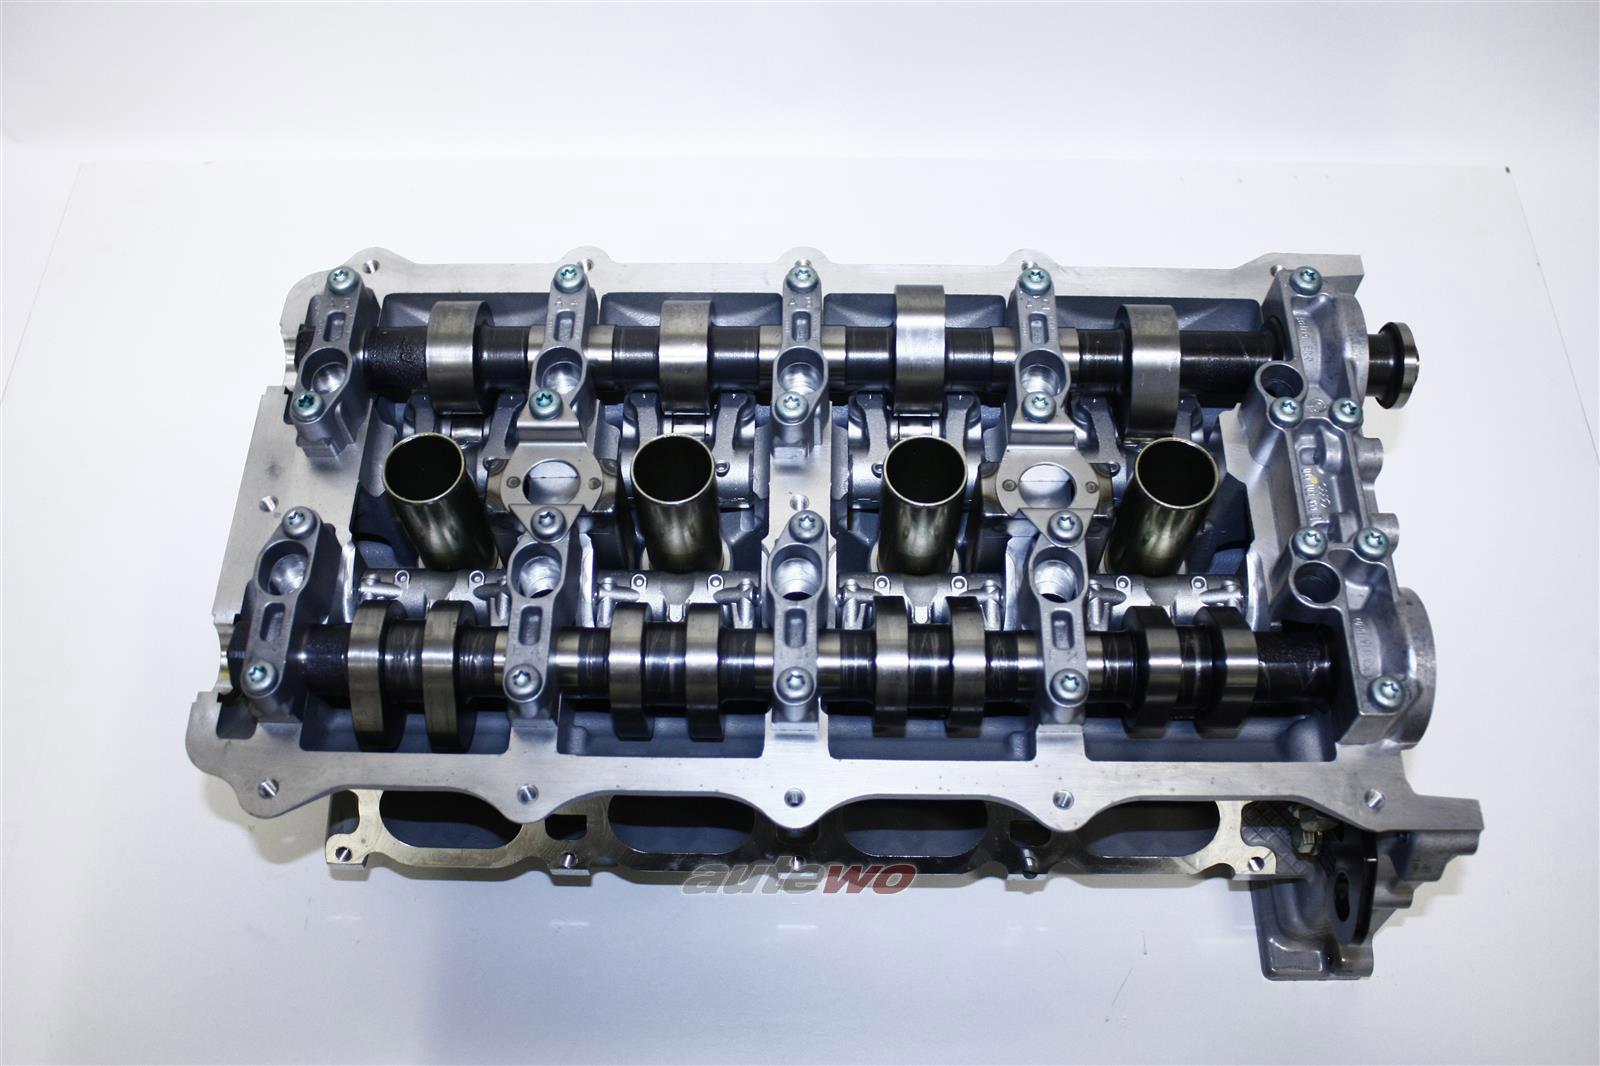 079103064RX/FX NEU Audi A6 4B Allroad 4.2l Zylinderkopf Rechts